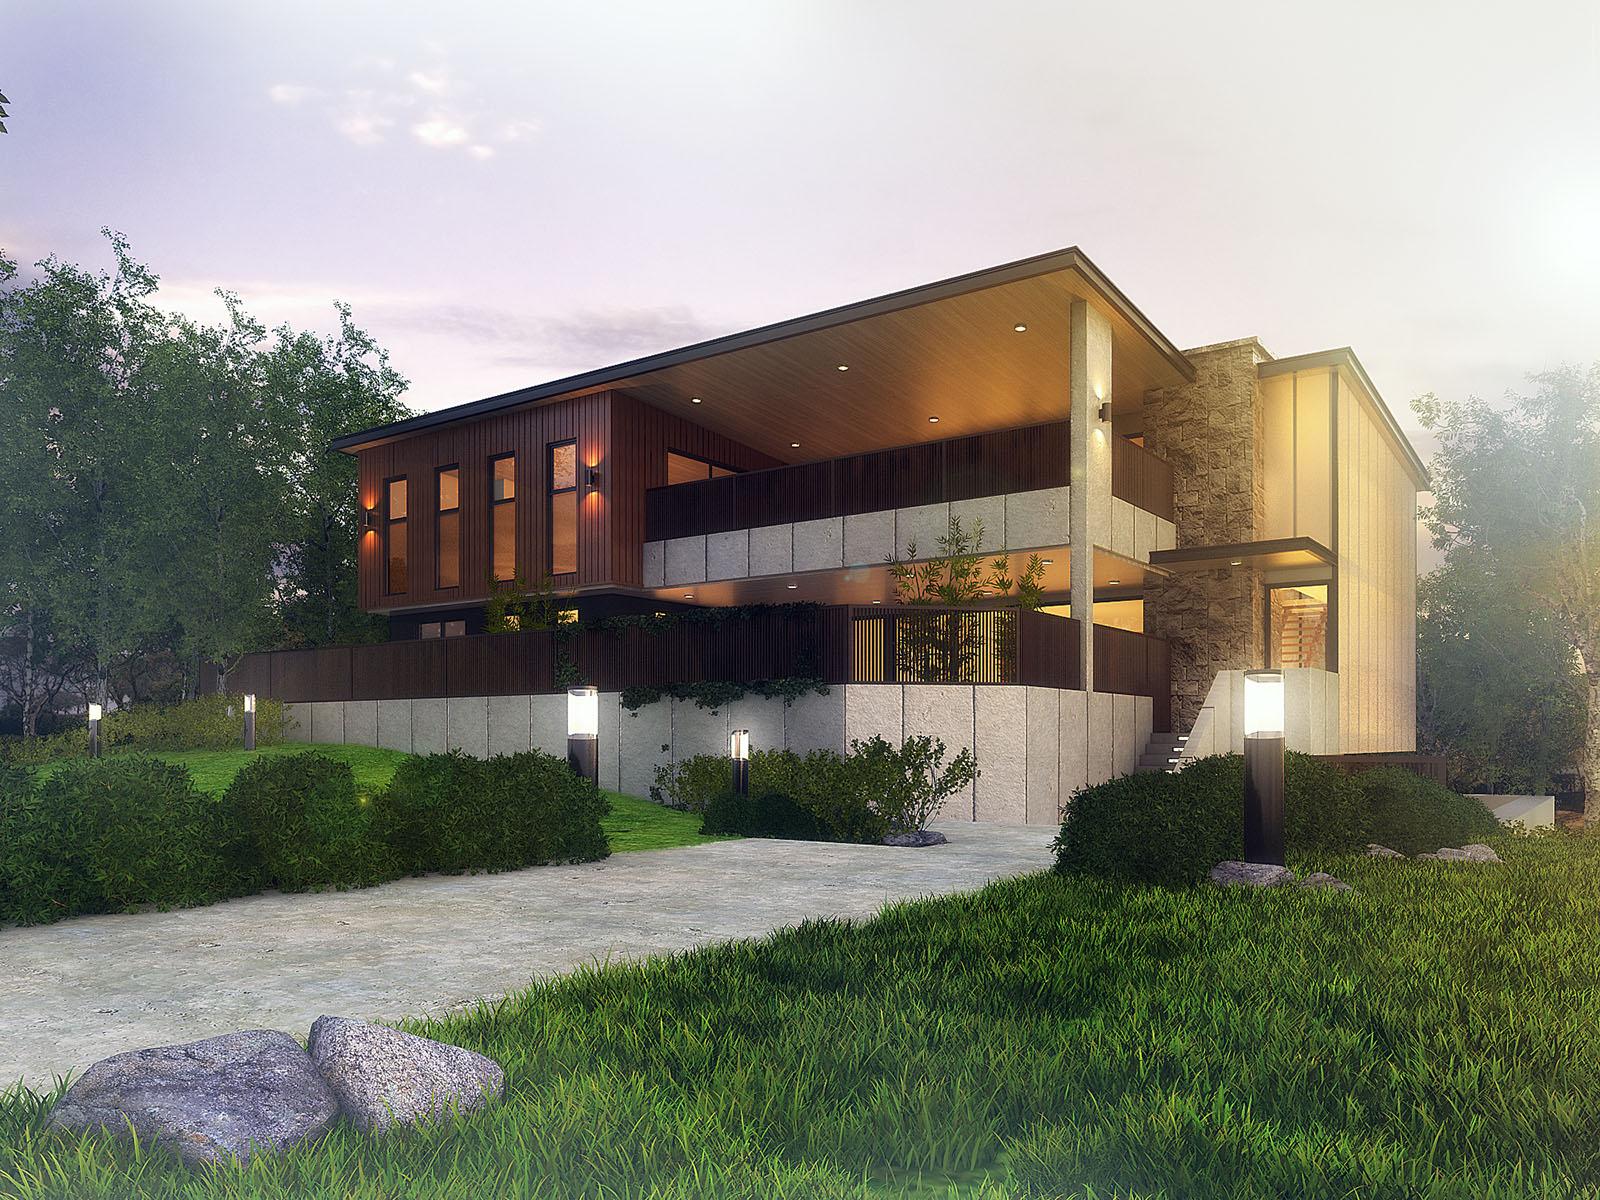 Hale Street Residence: Perth Building Design